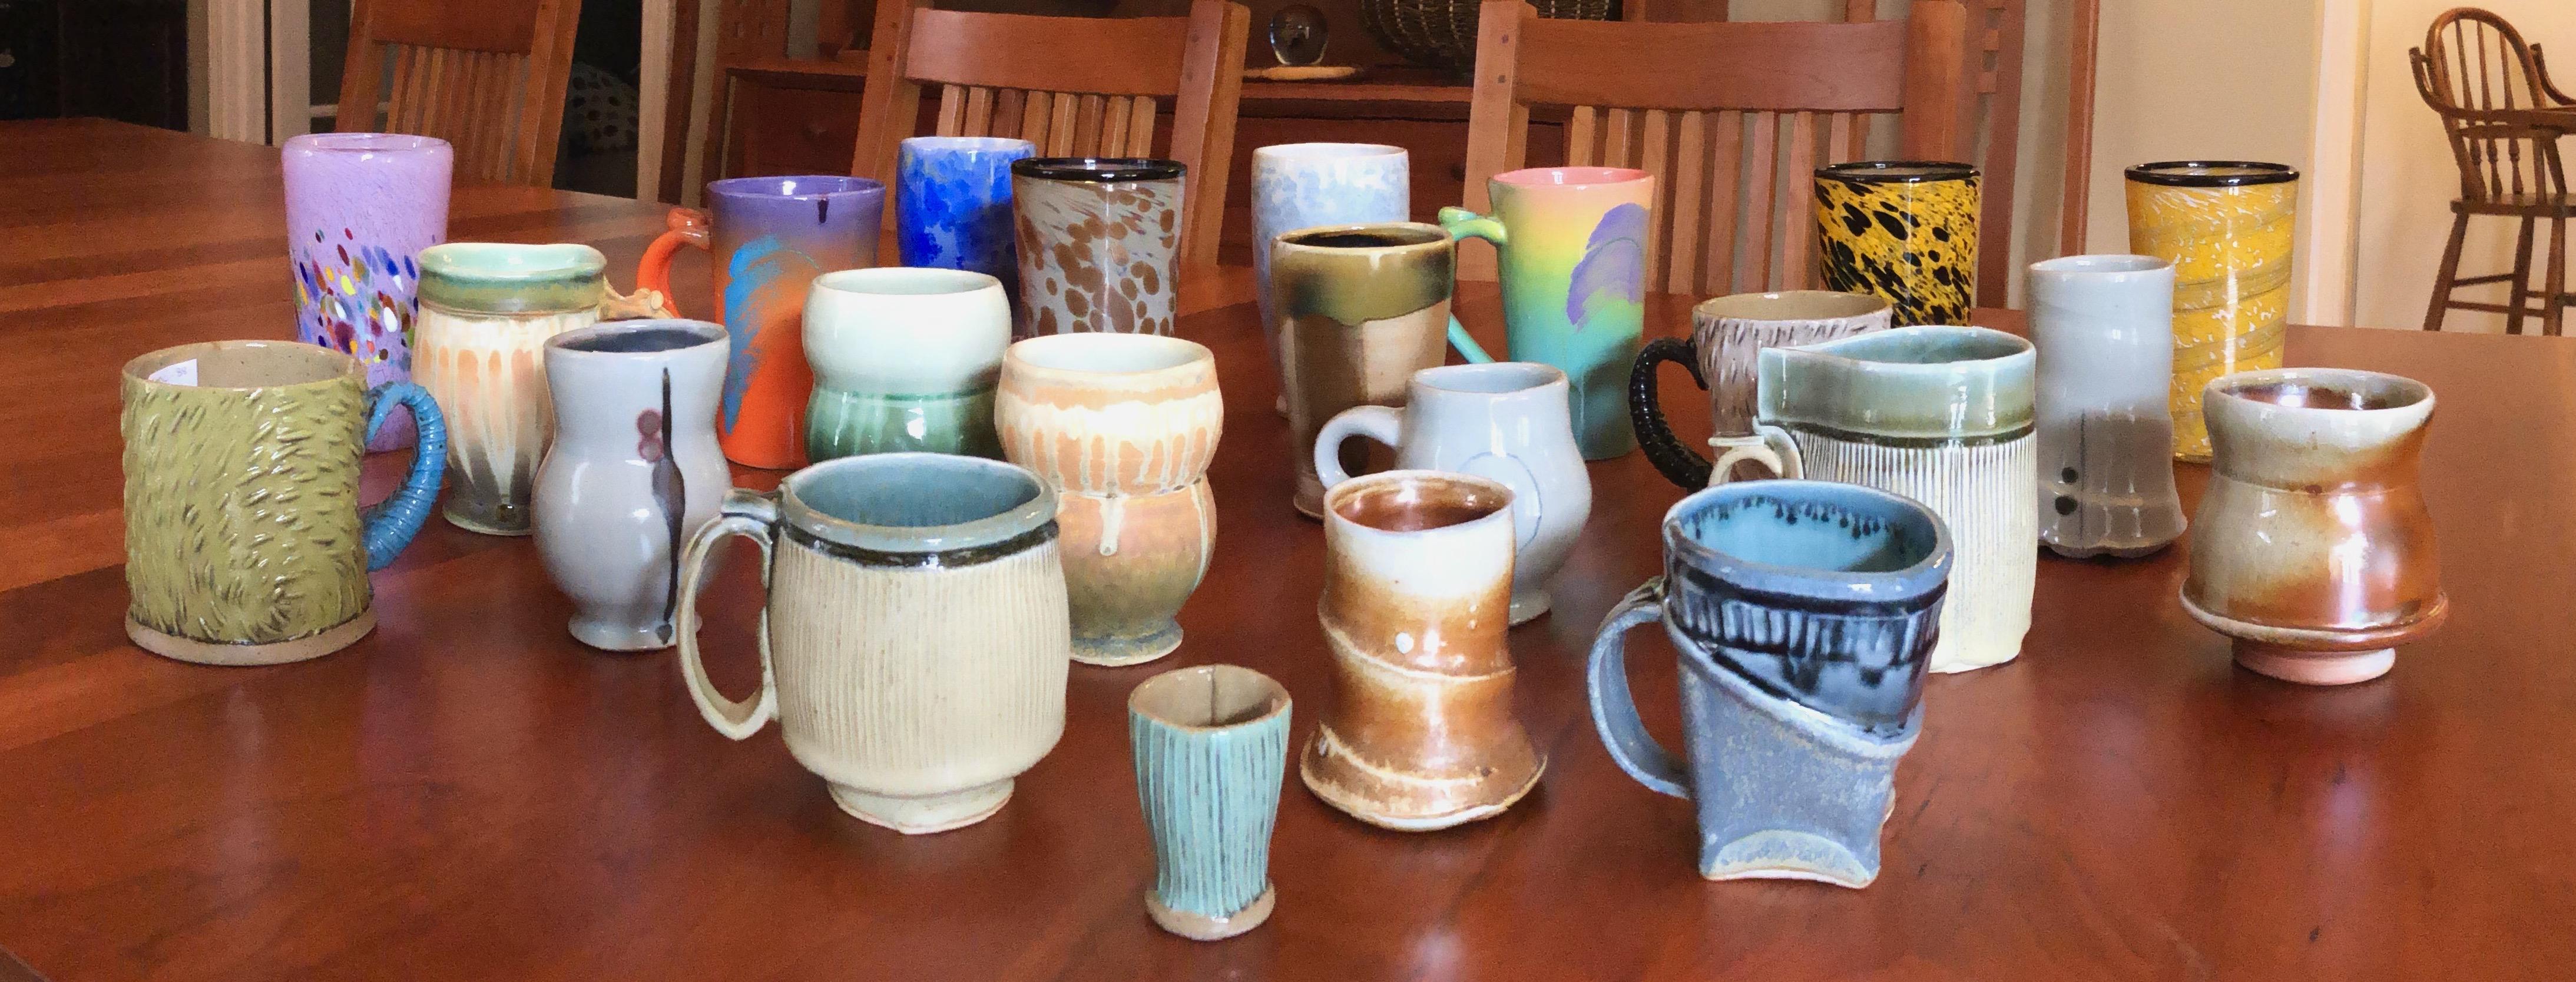 mugs mugs and more mugs